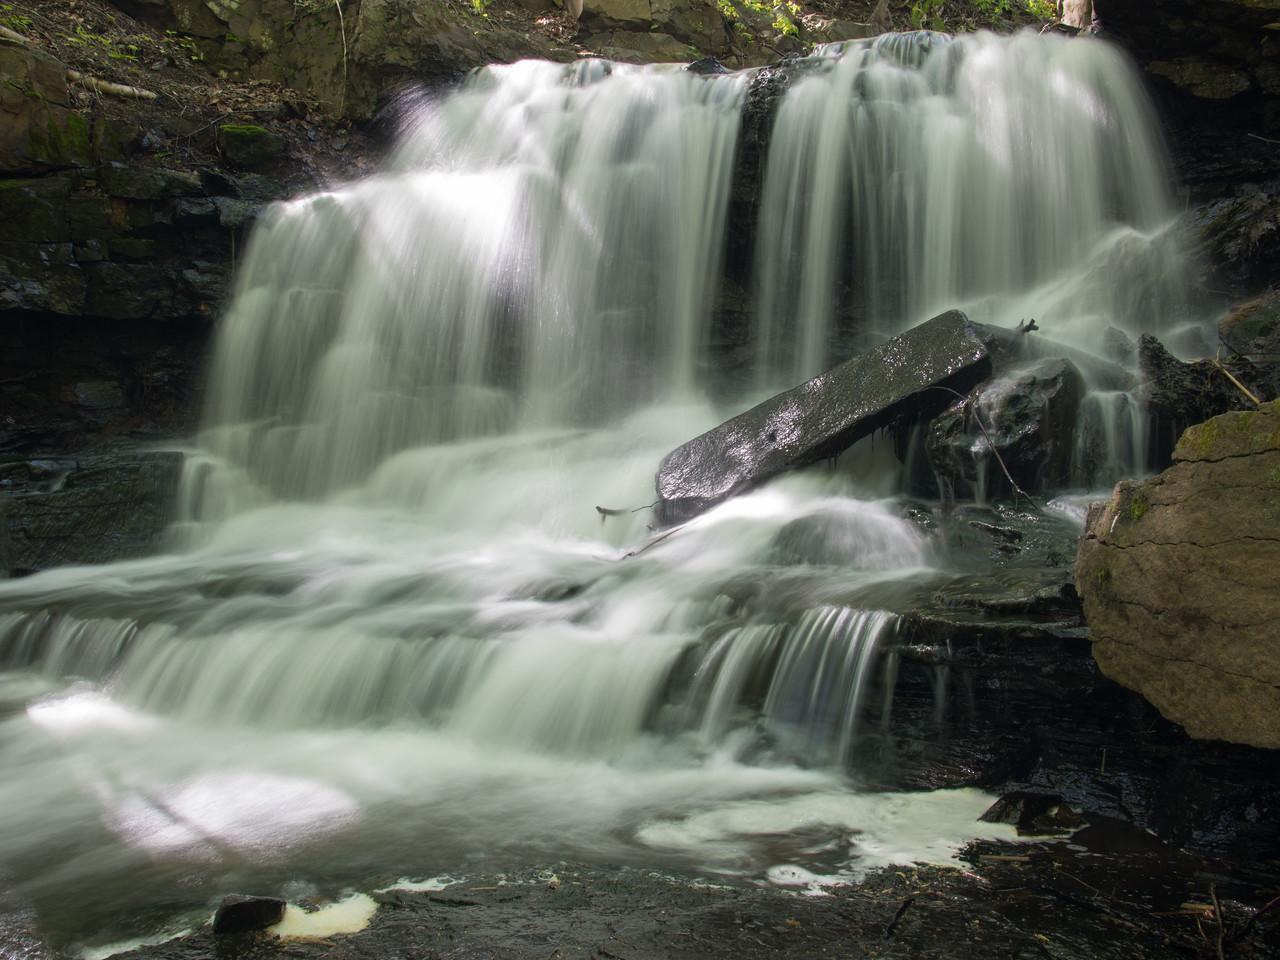 Dividend Falls